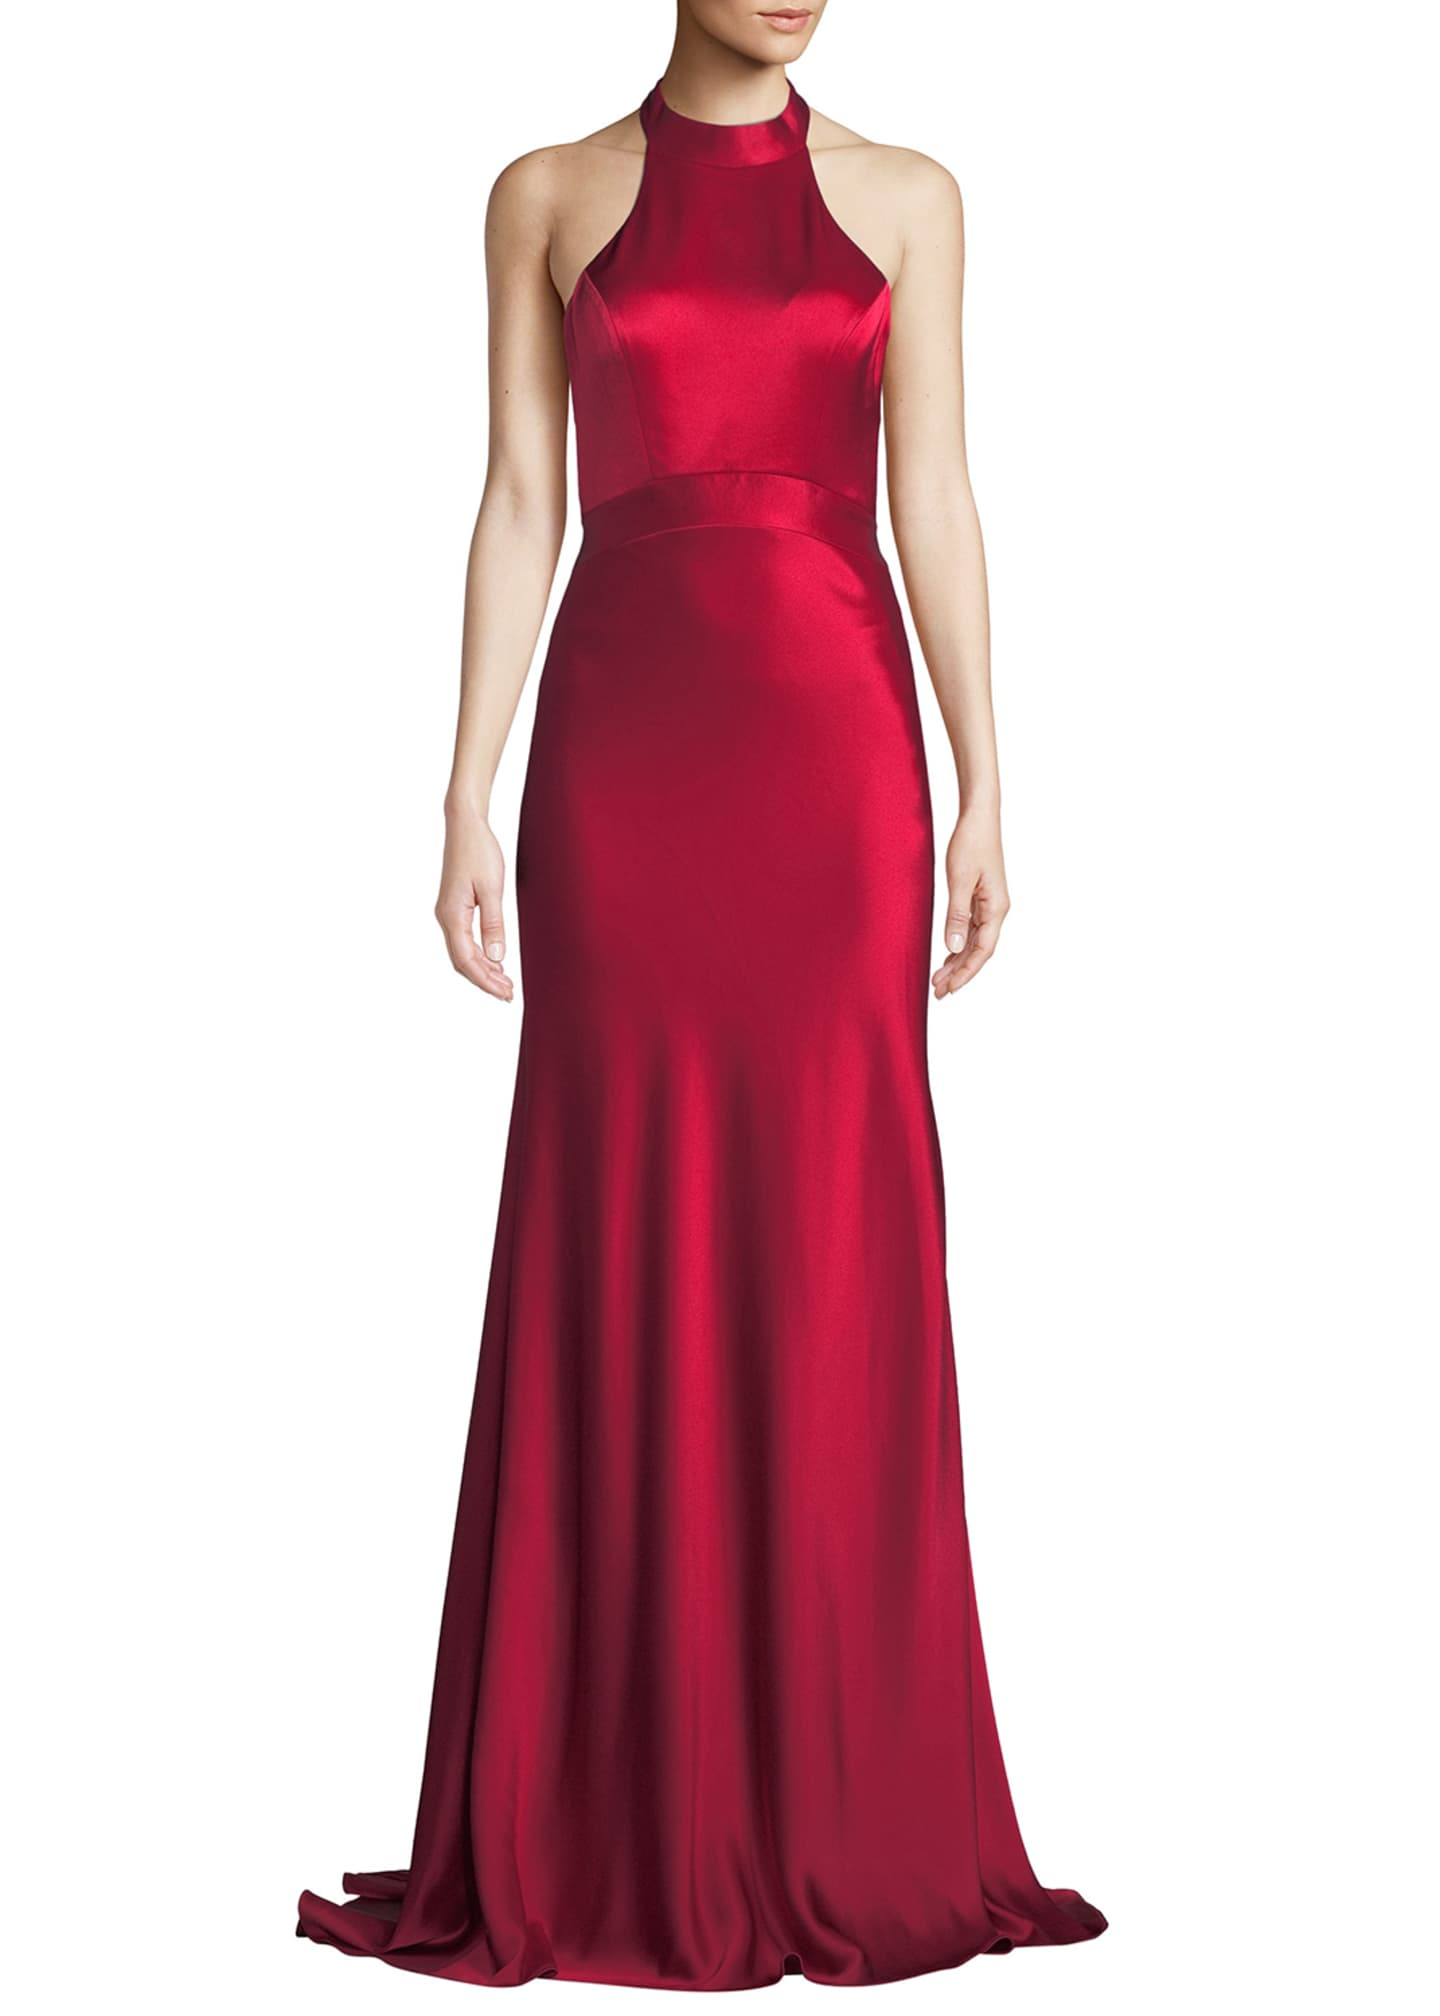 Catherine Deane Kin Satin Halter Gown w/ Open